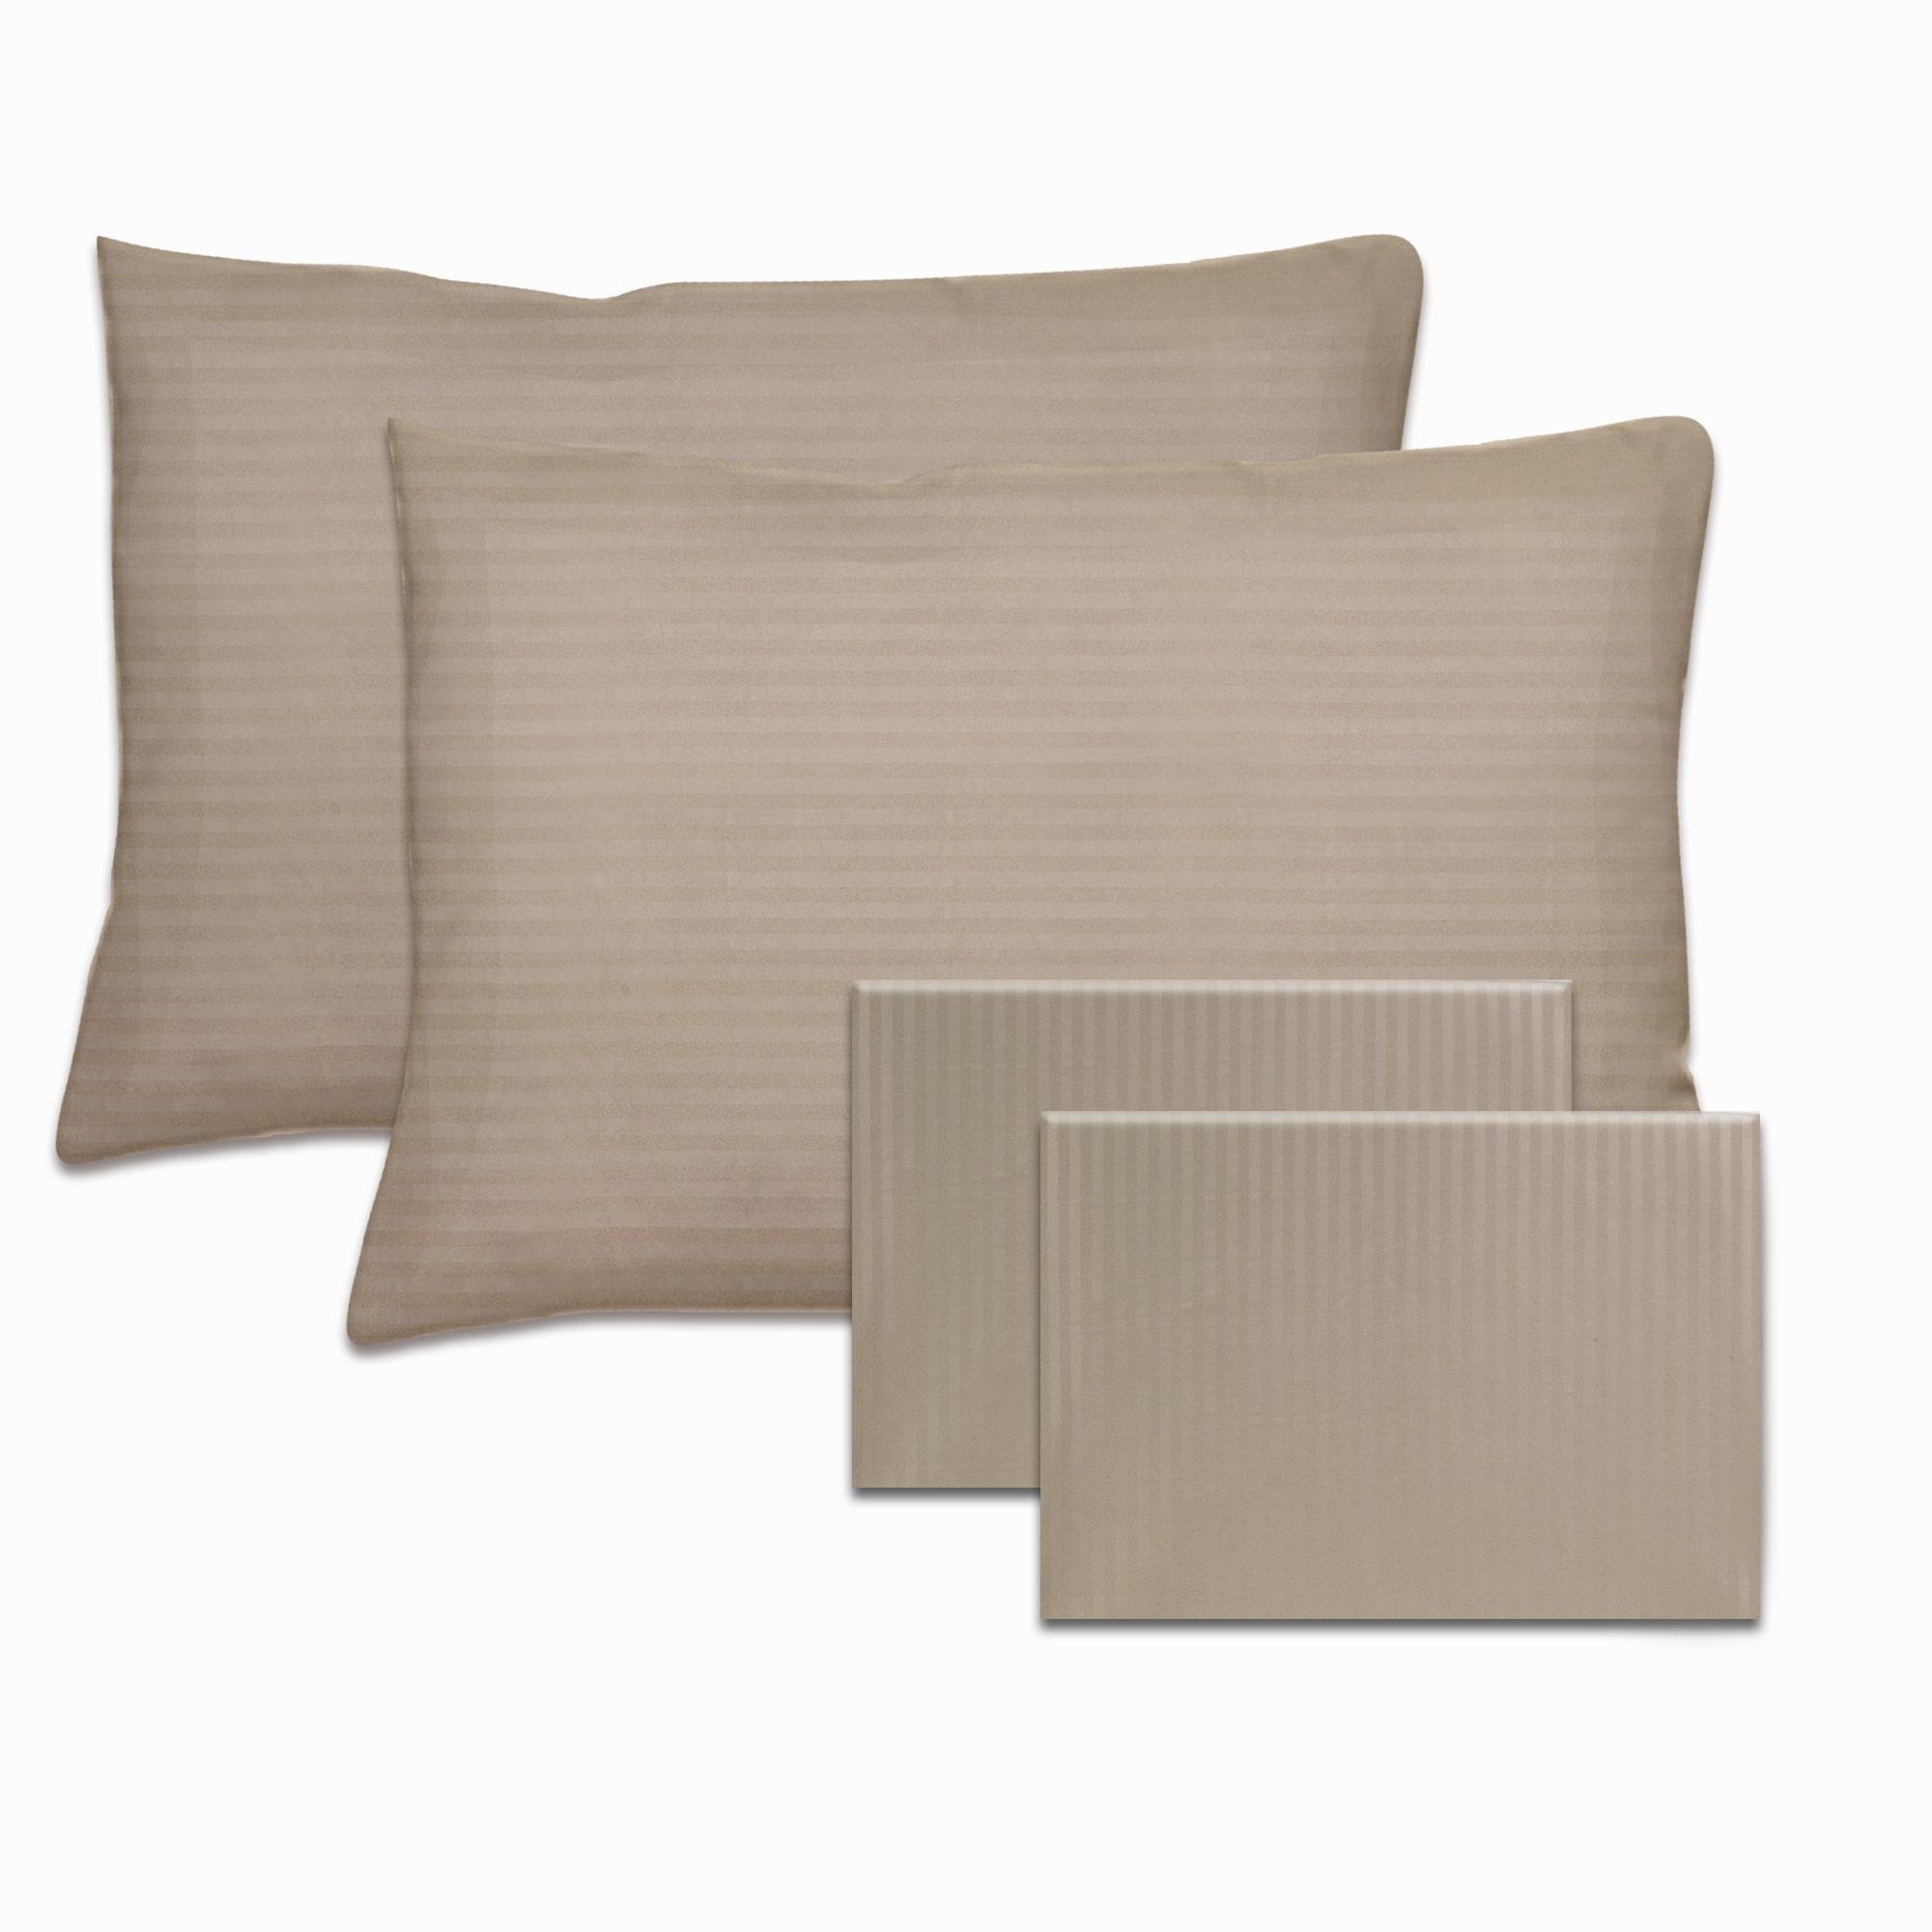 Jogo de Cama Percal de Microfibra Luma Comfort Casal 4 Peças